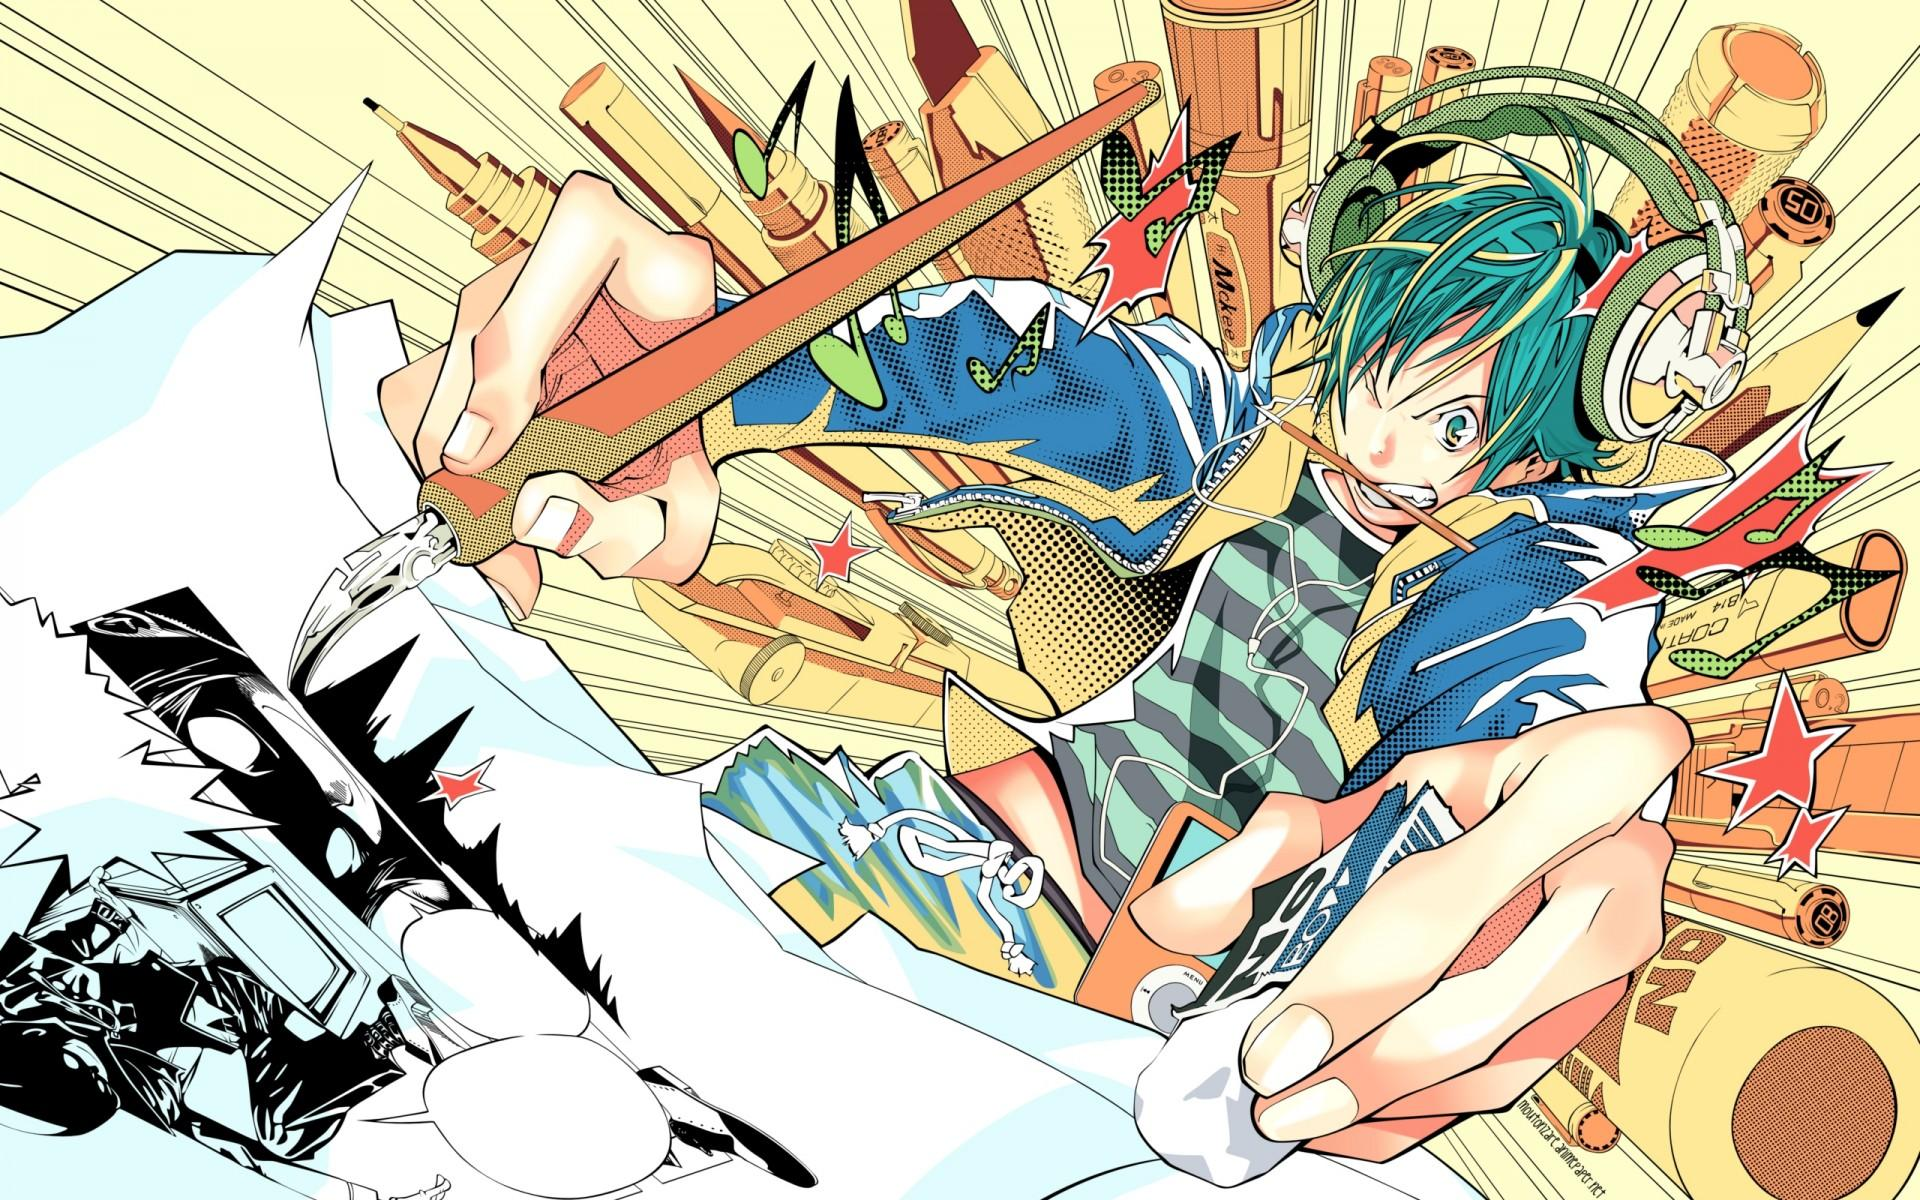 Manga is just insanity. Really.